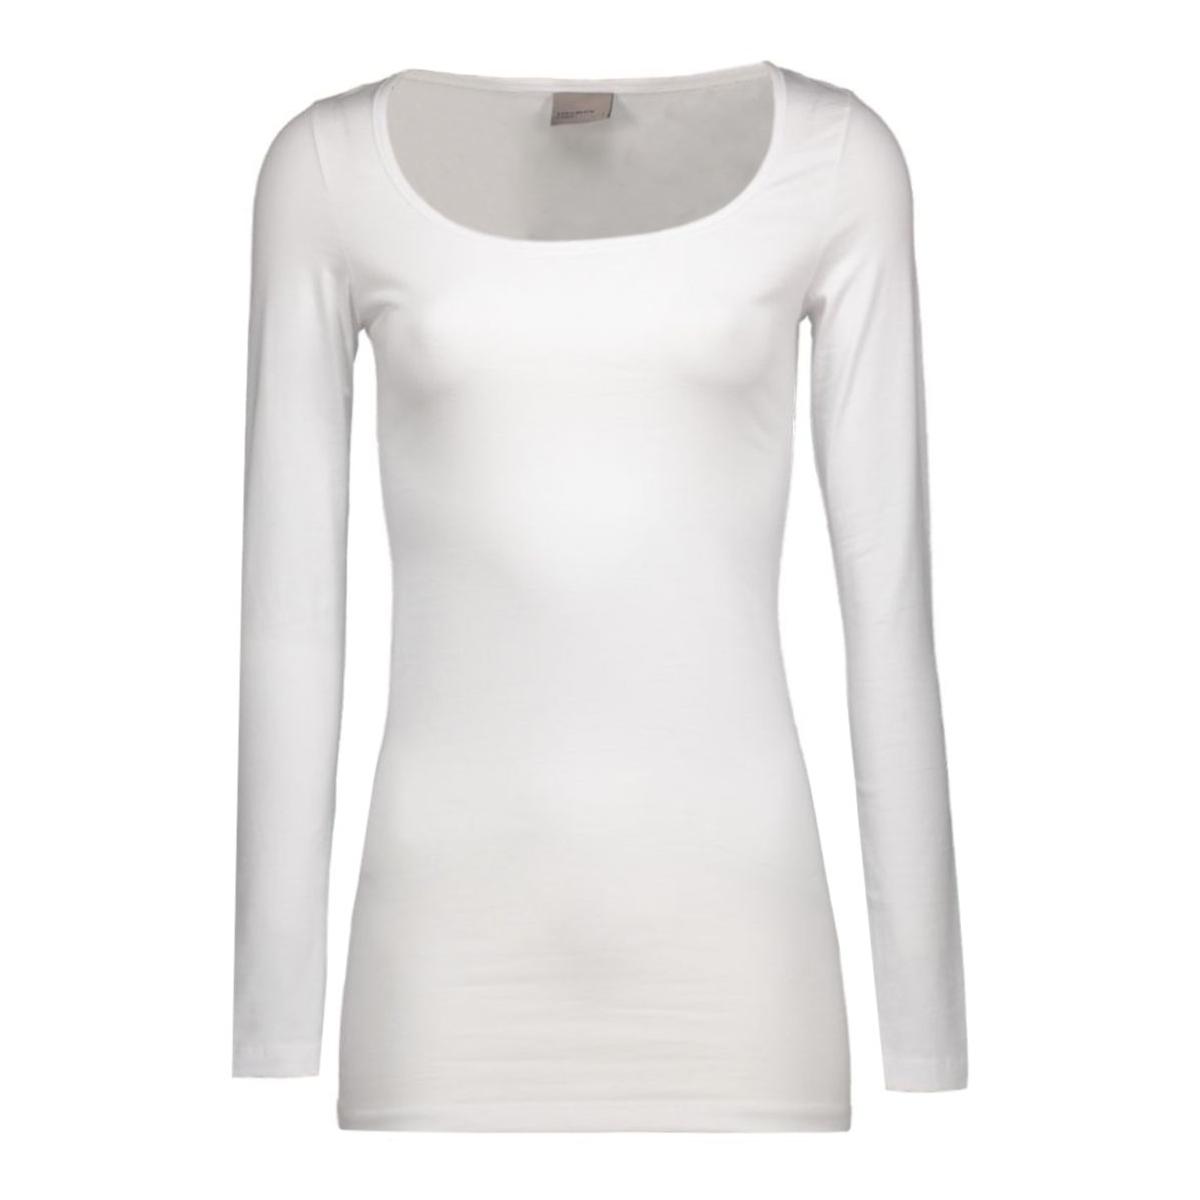 maxi my ls long u-neck 10059320 vero moda t-shirt opt white